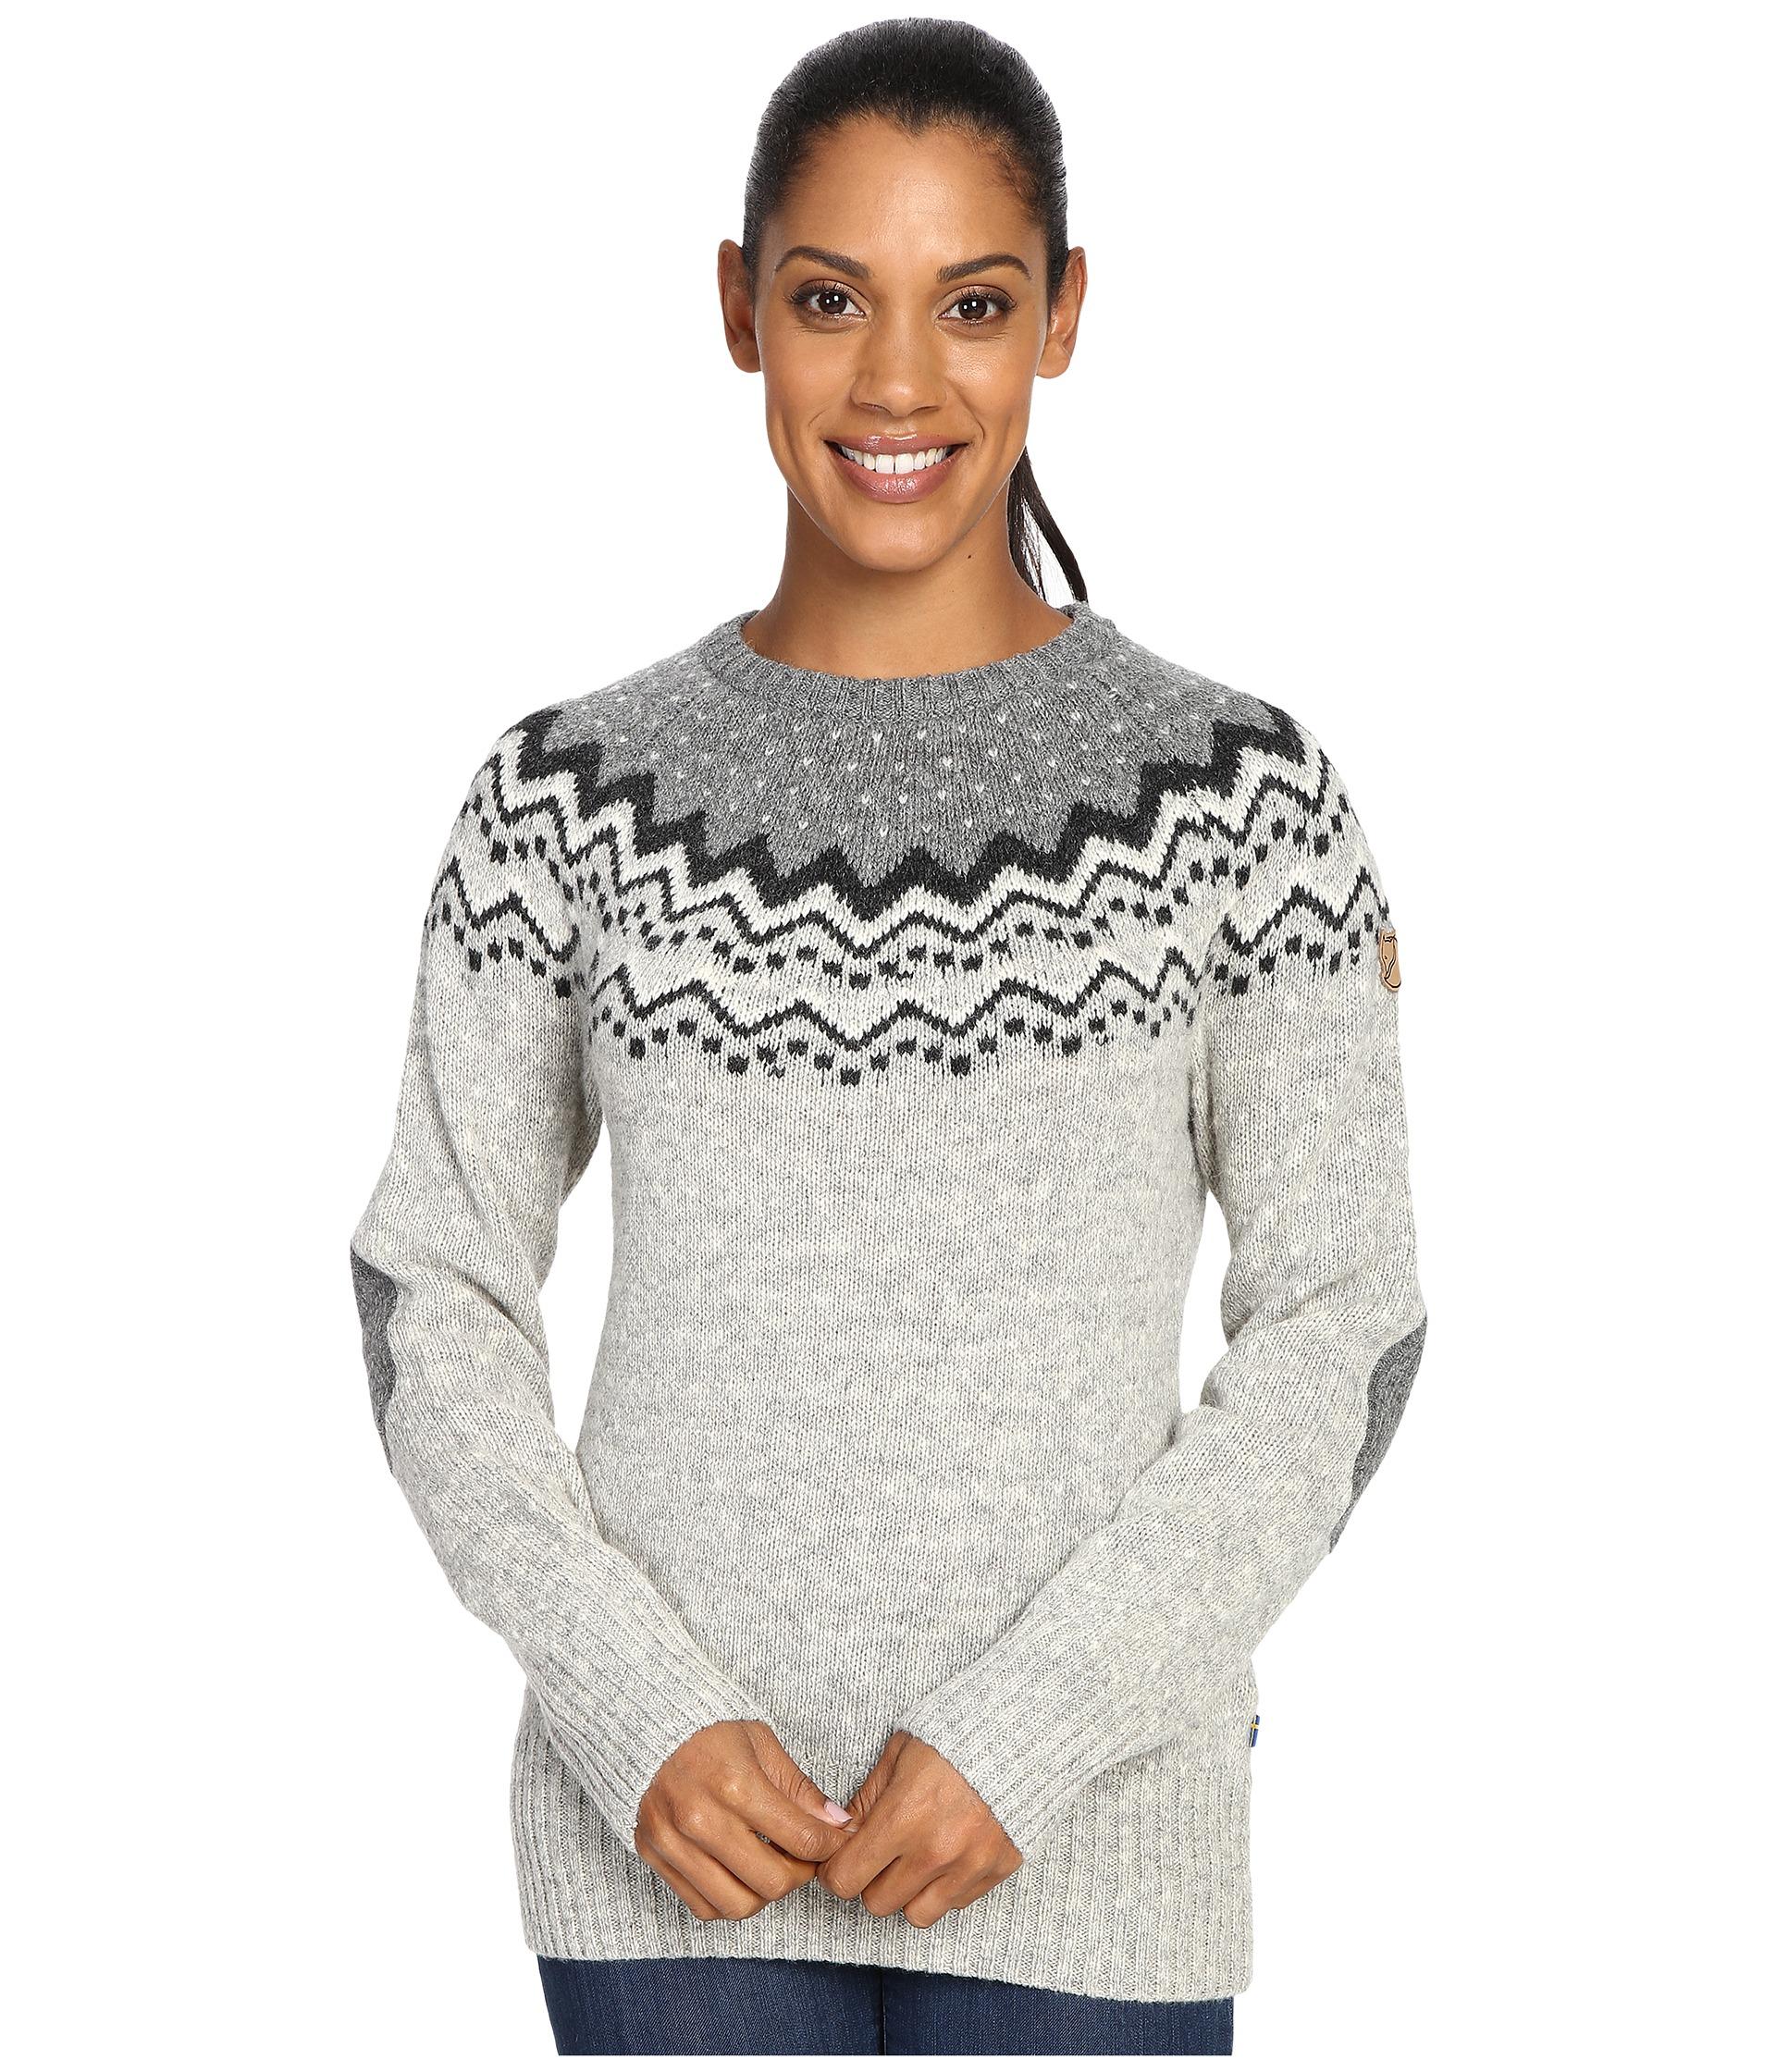 aa21795d0749 Lyst - Fjallraven Övik Knit Sweater in Gray